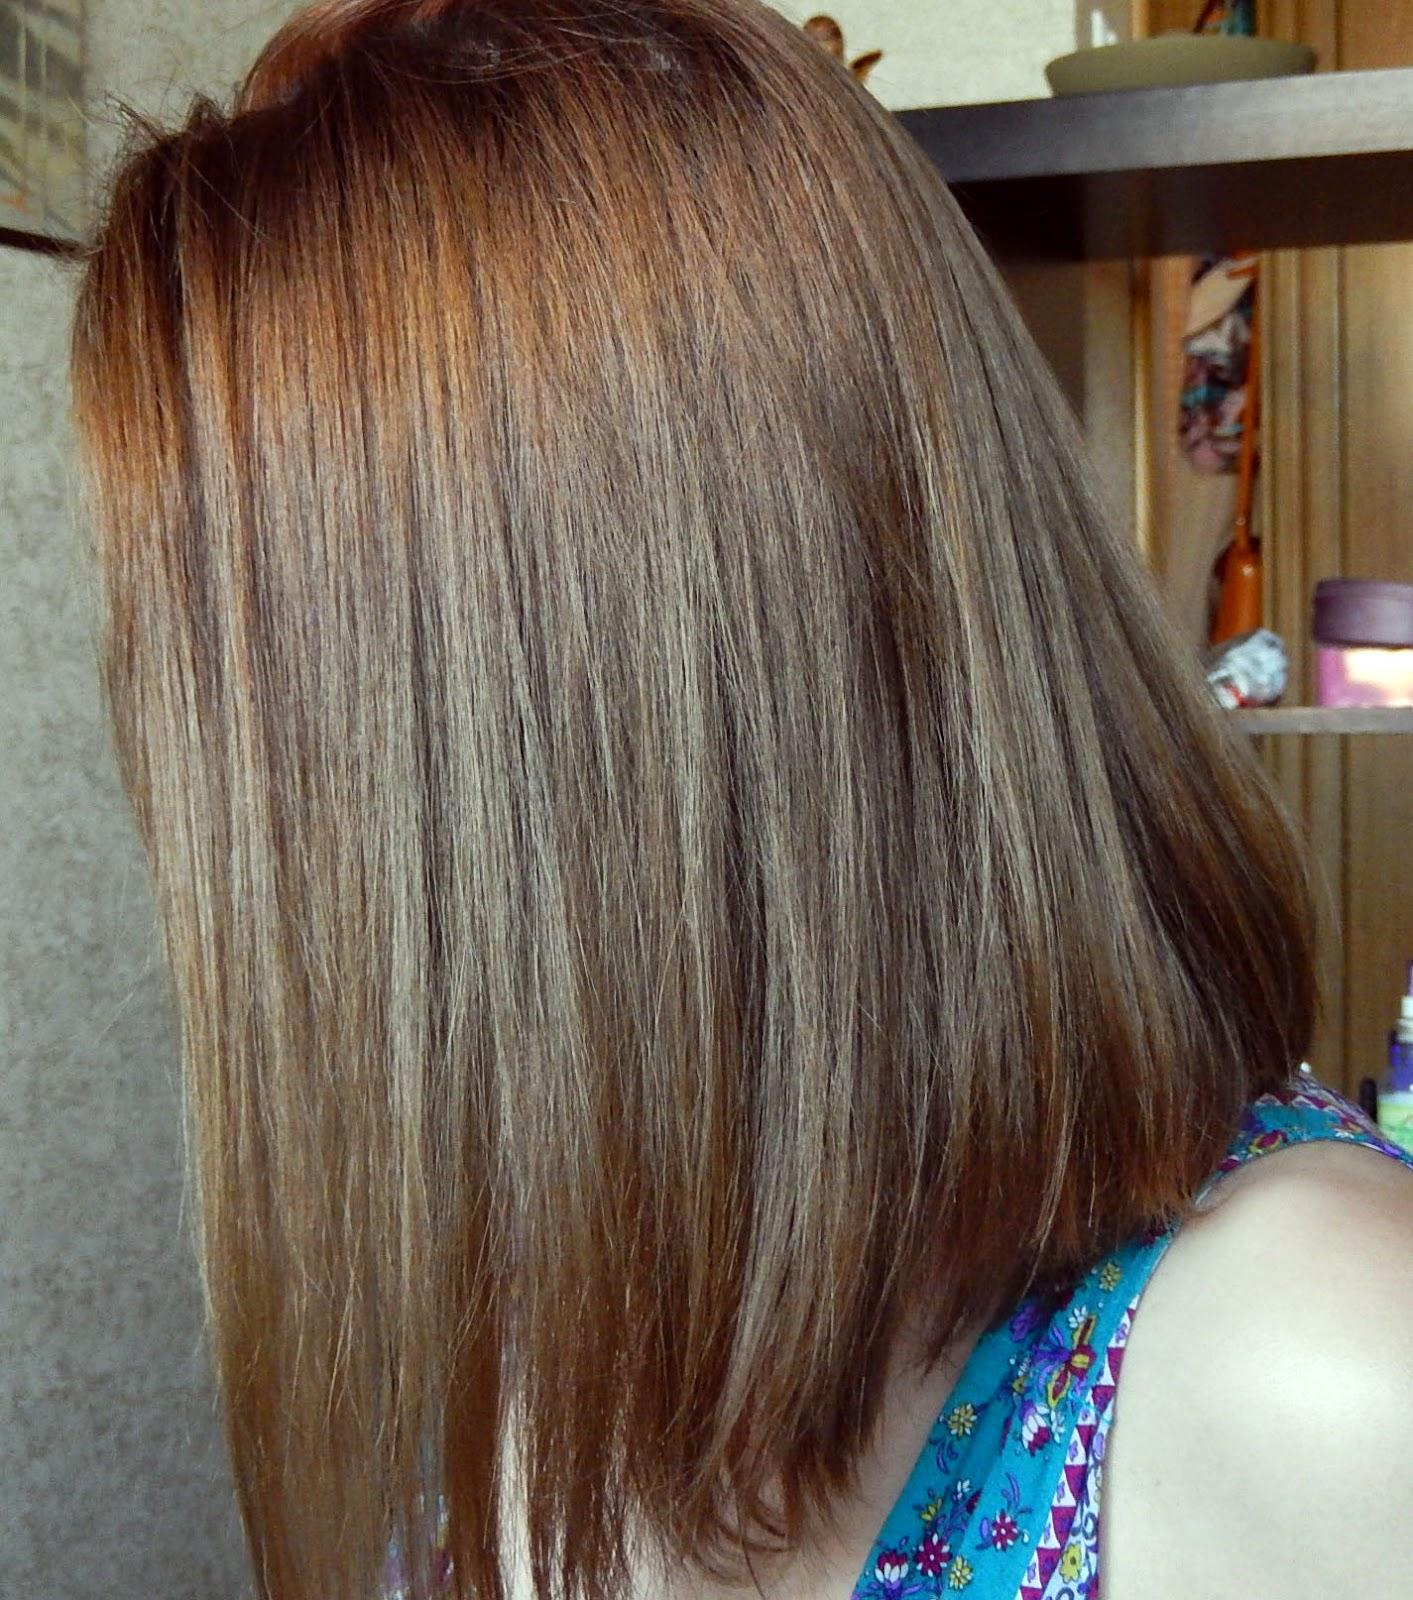 8 тон краски для волос фото